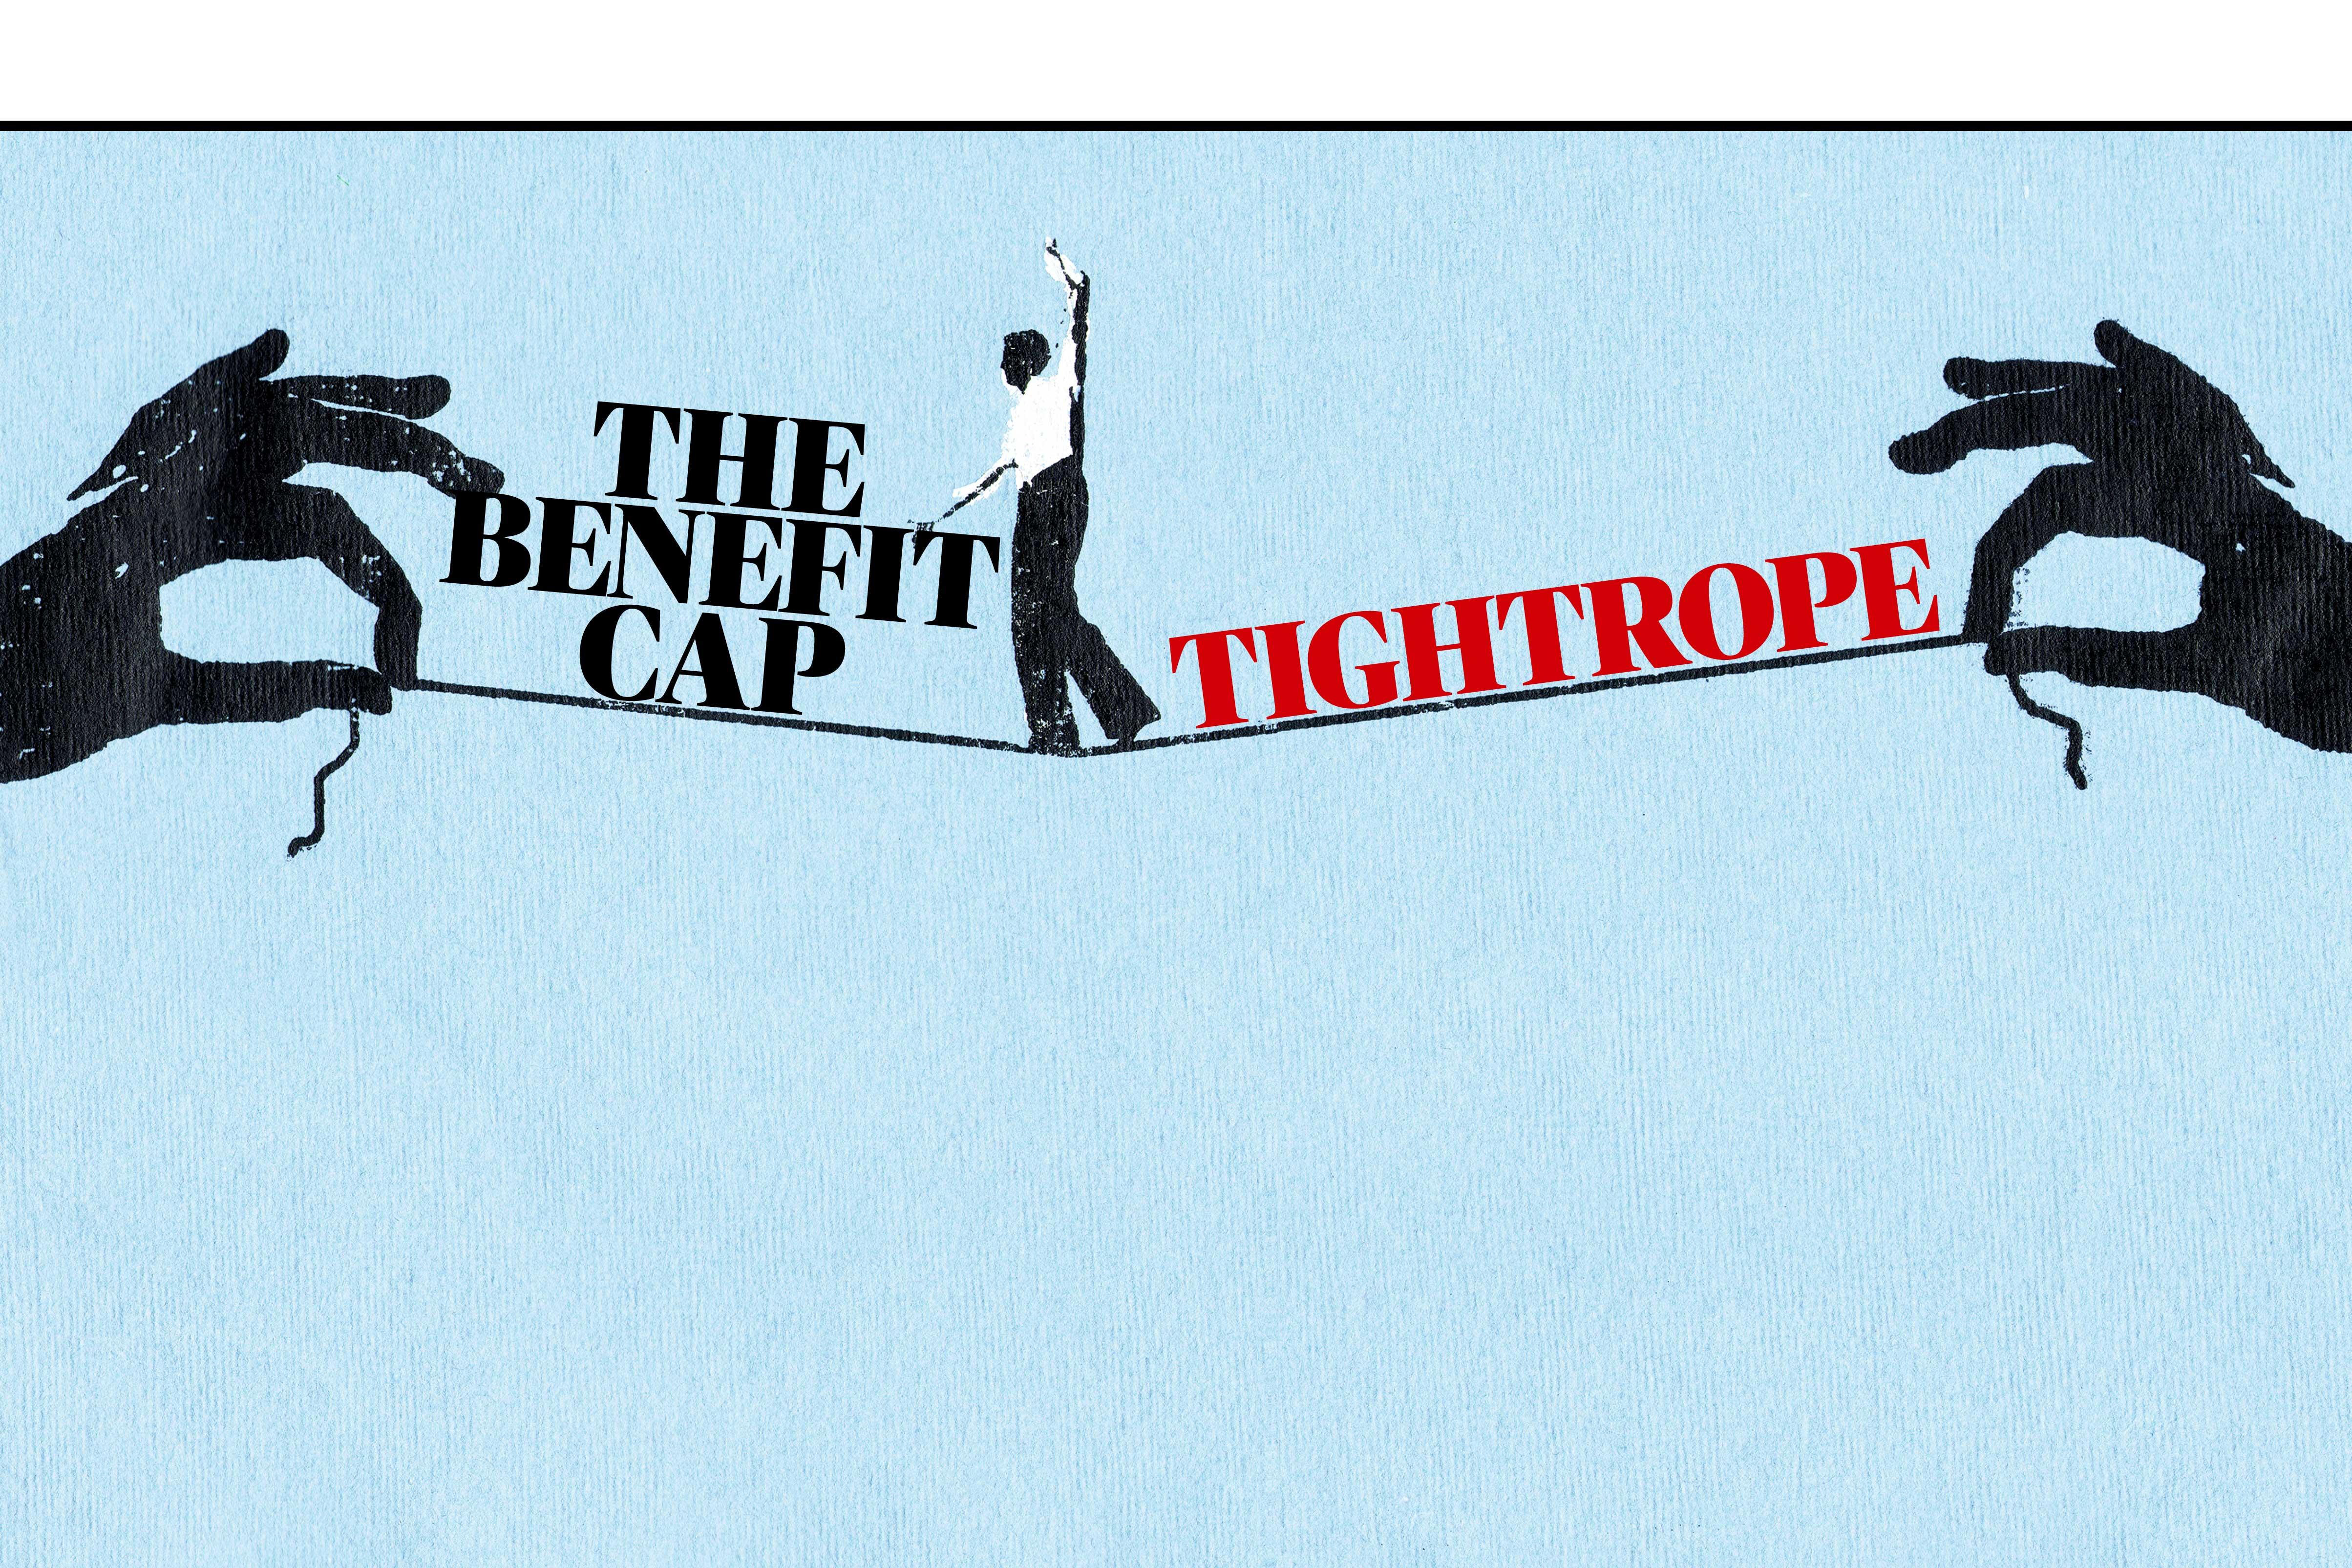 The benefit cap tightrope